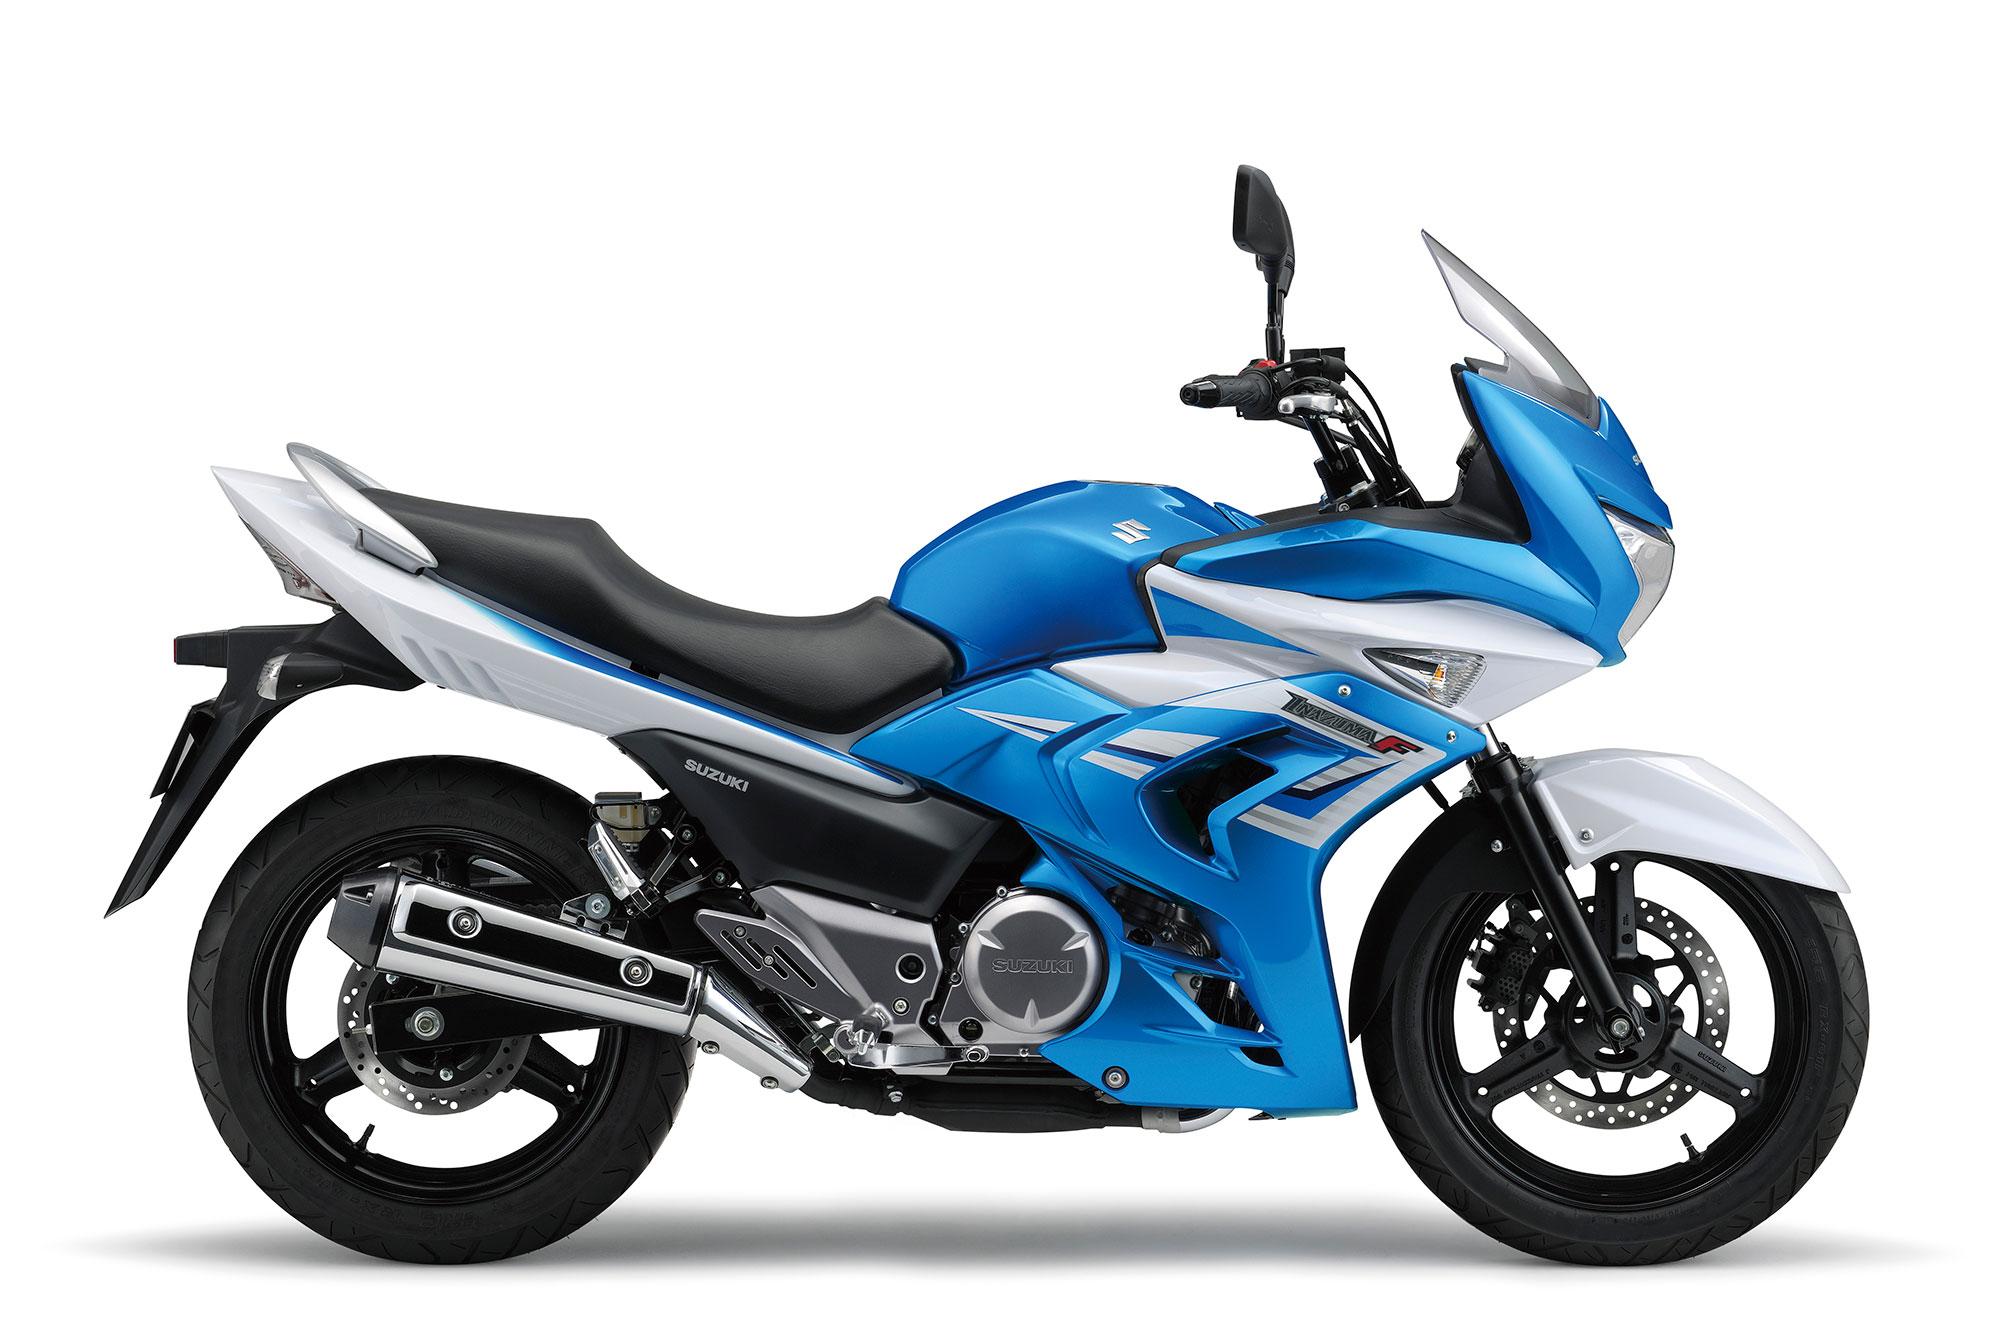 The Bike Advice: Suzuki Inazuma 250 a tough competitor for